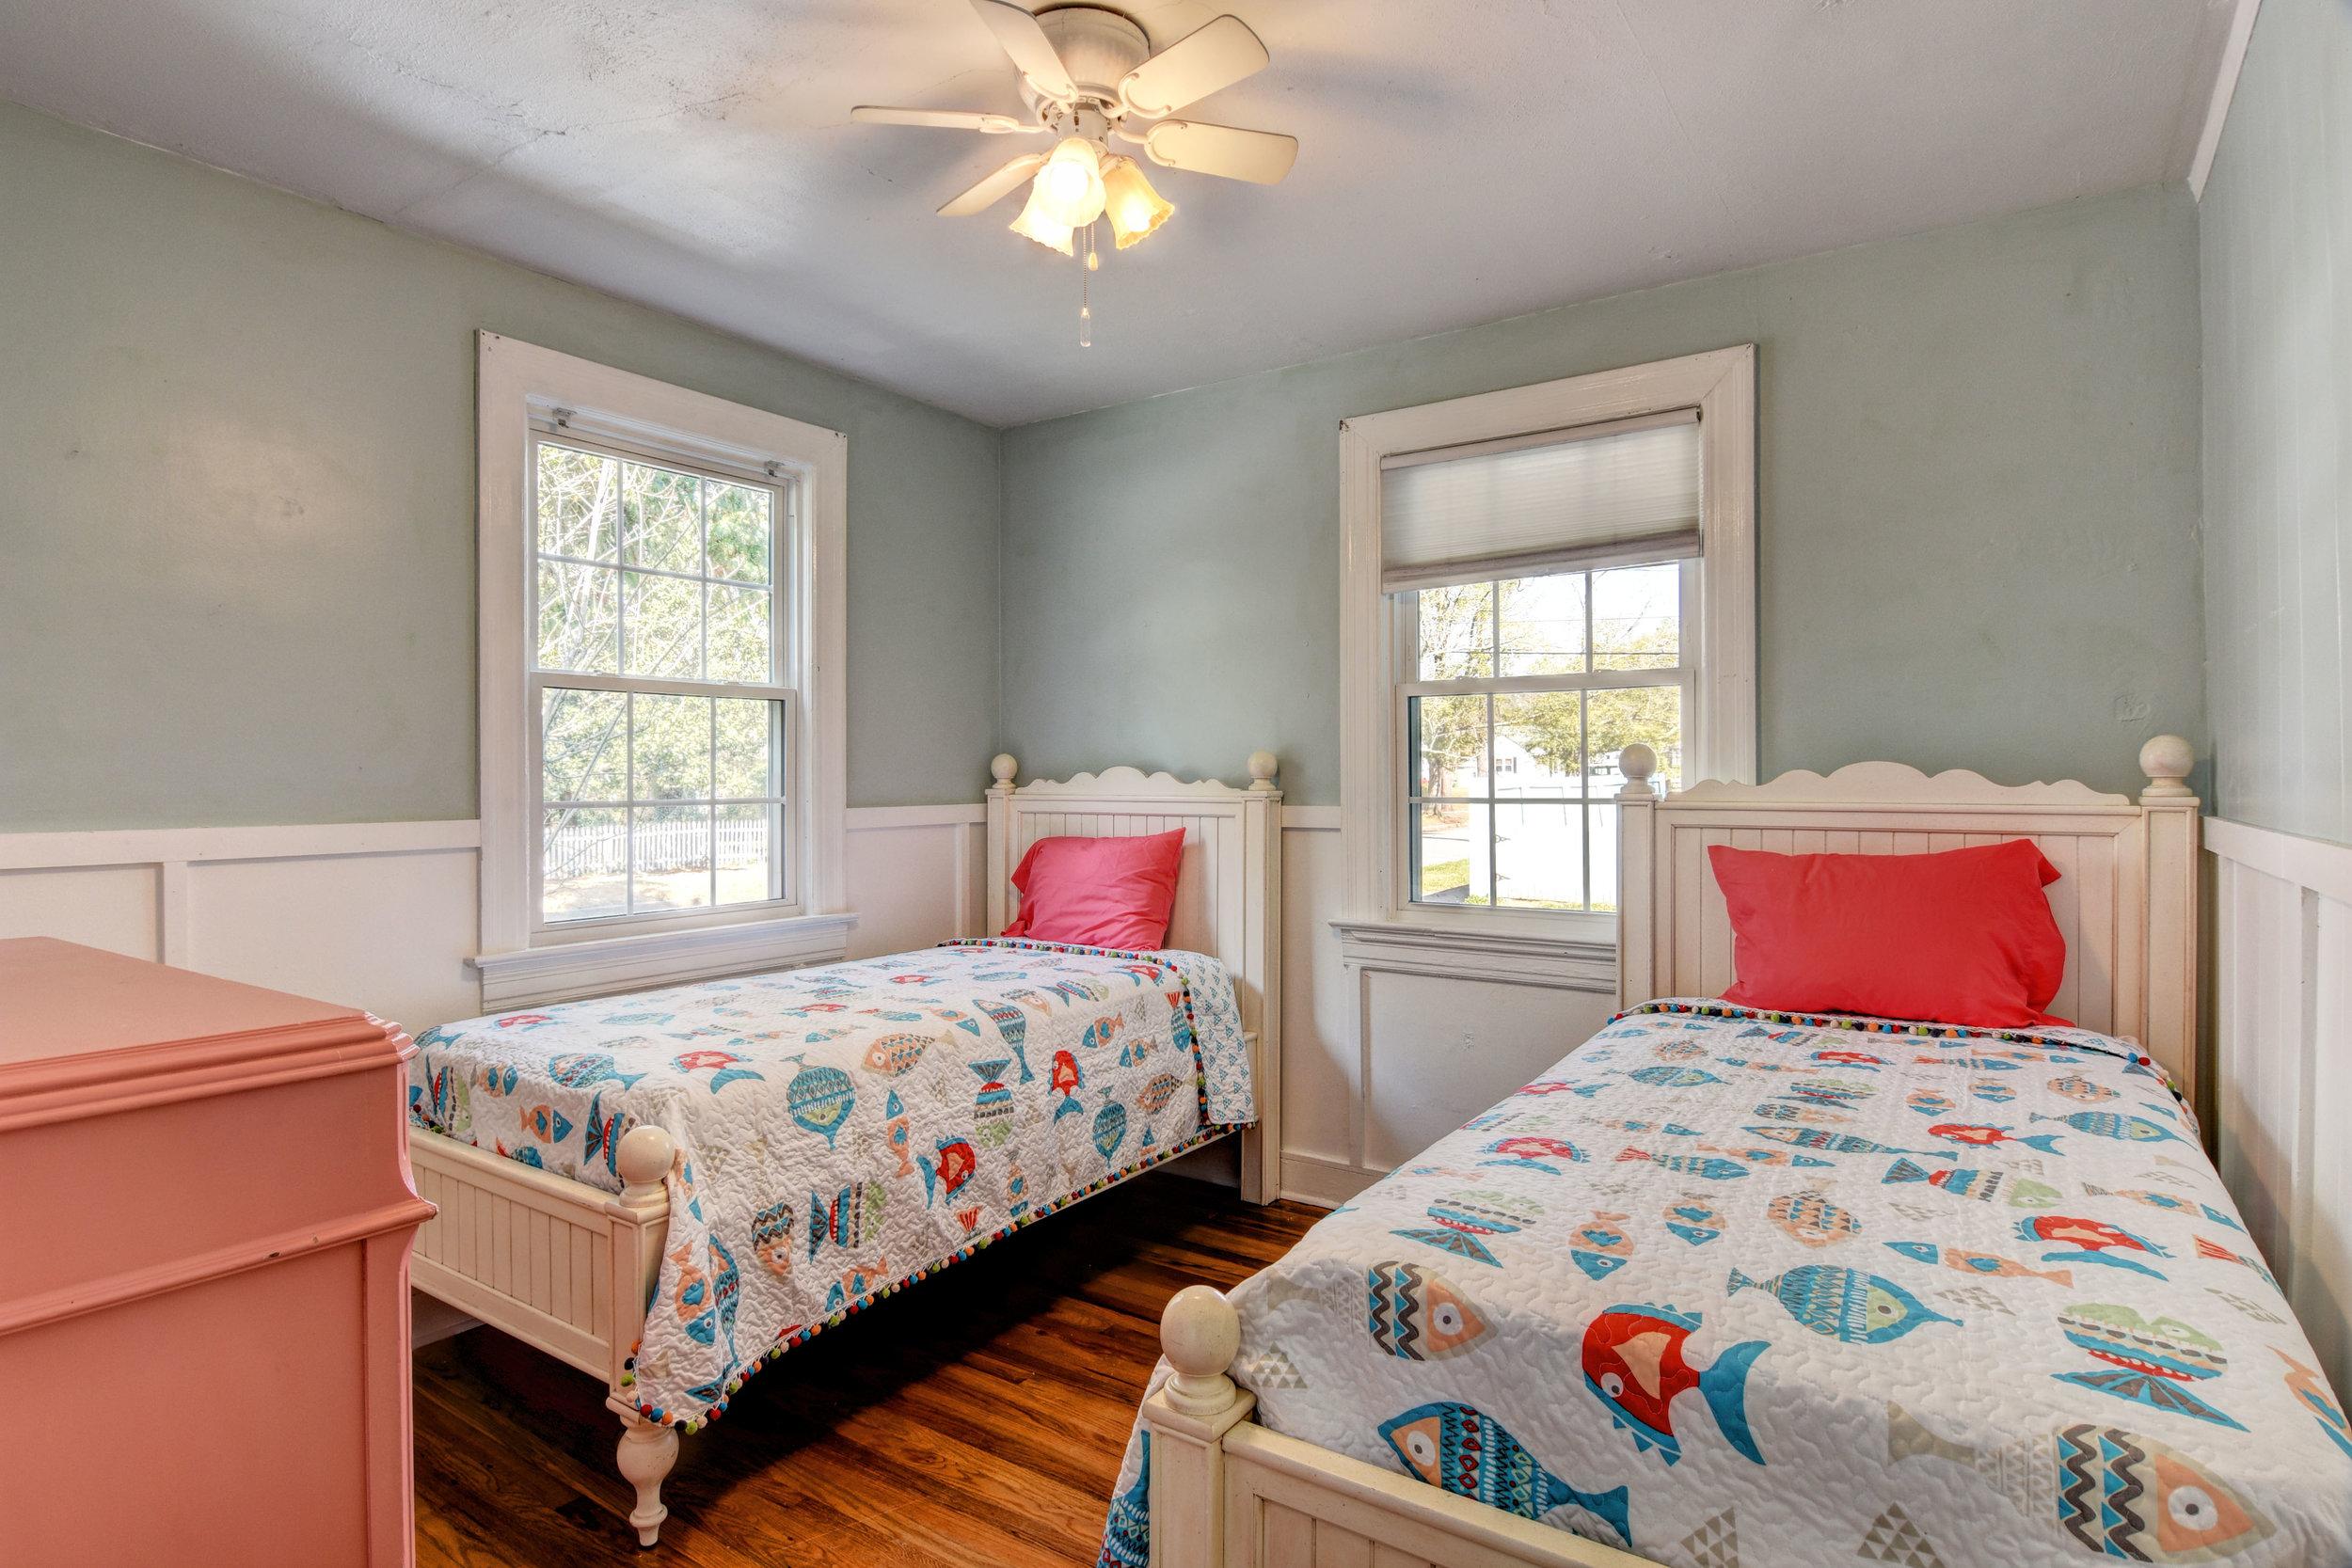 2101 Plaza Dr Wilmington NC-print-022-25-Bedroom 3-4200x2802-300dpi.jpg